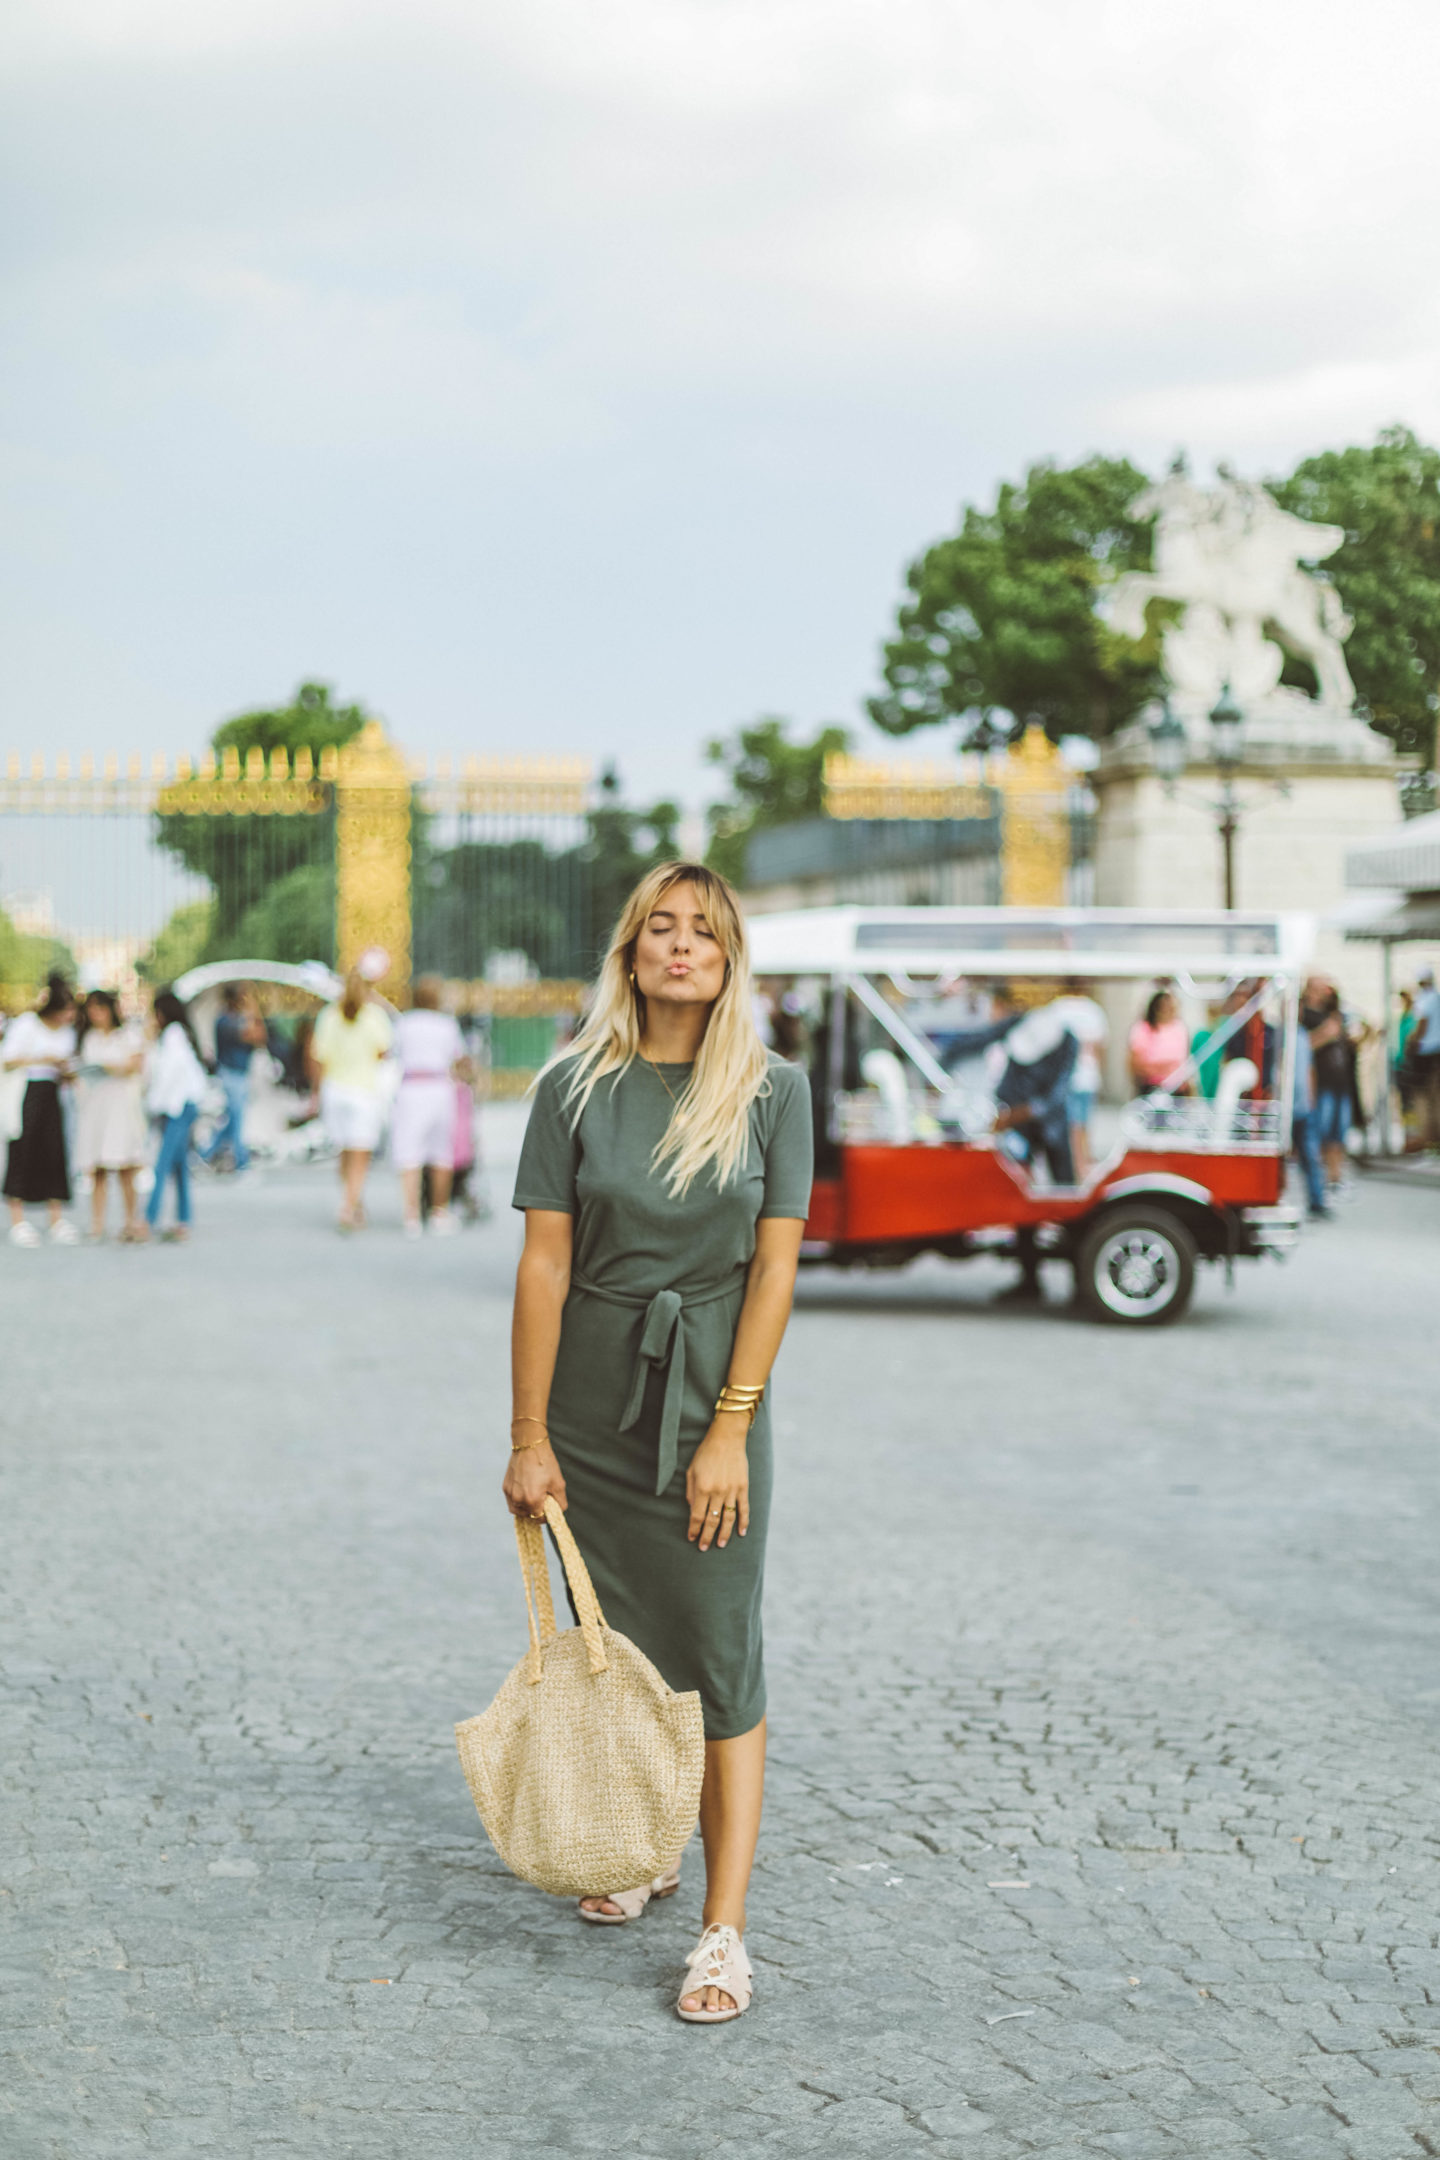 Robe kaki Topshop - Blondie Baby blog mode Paris et voyages